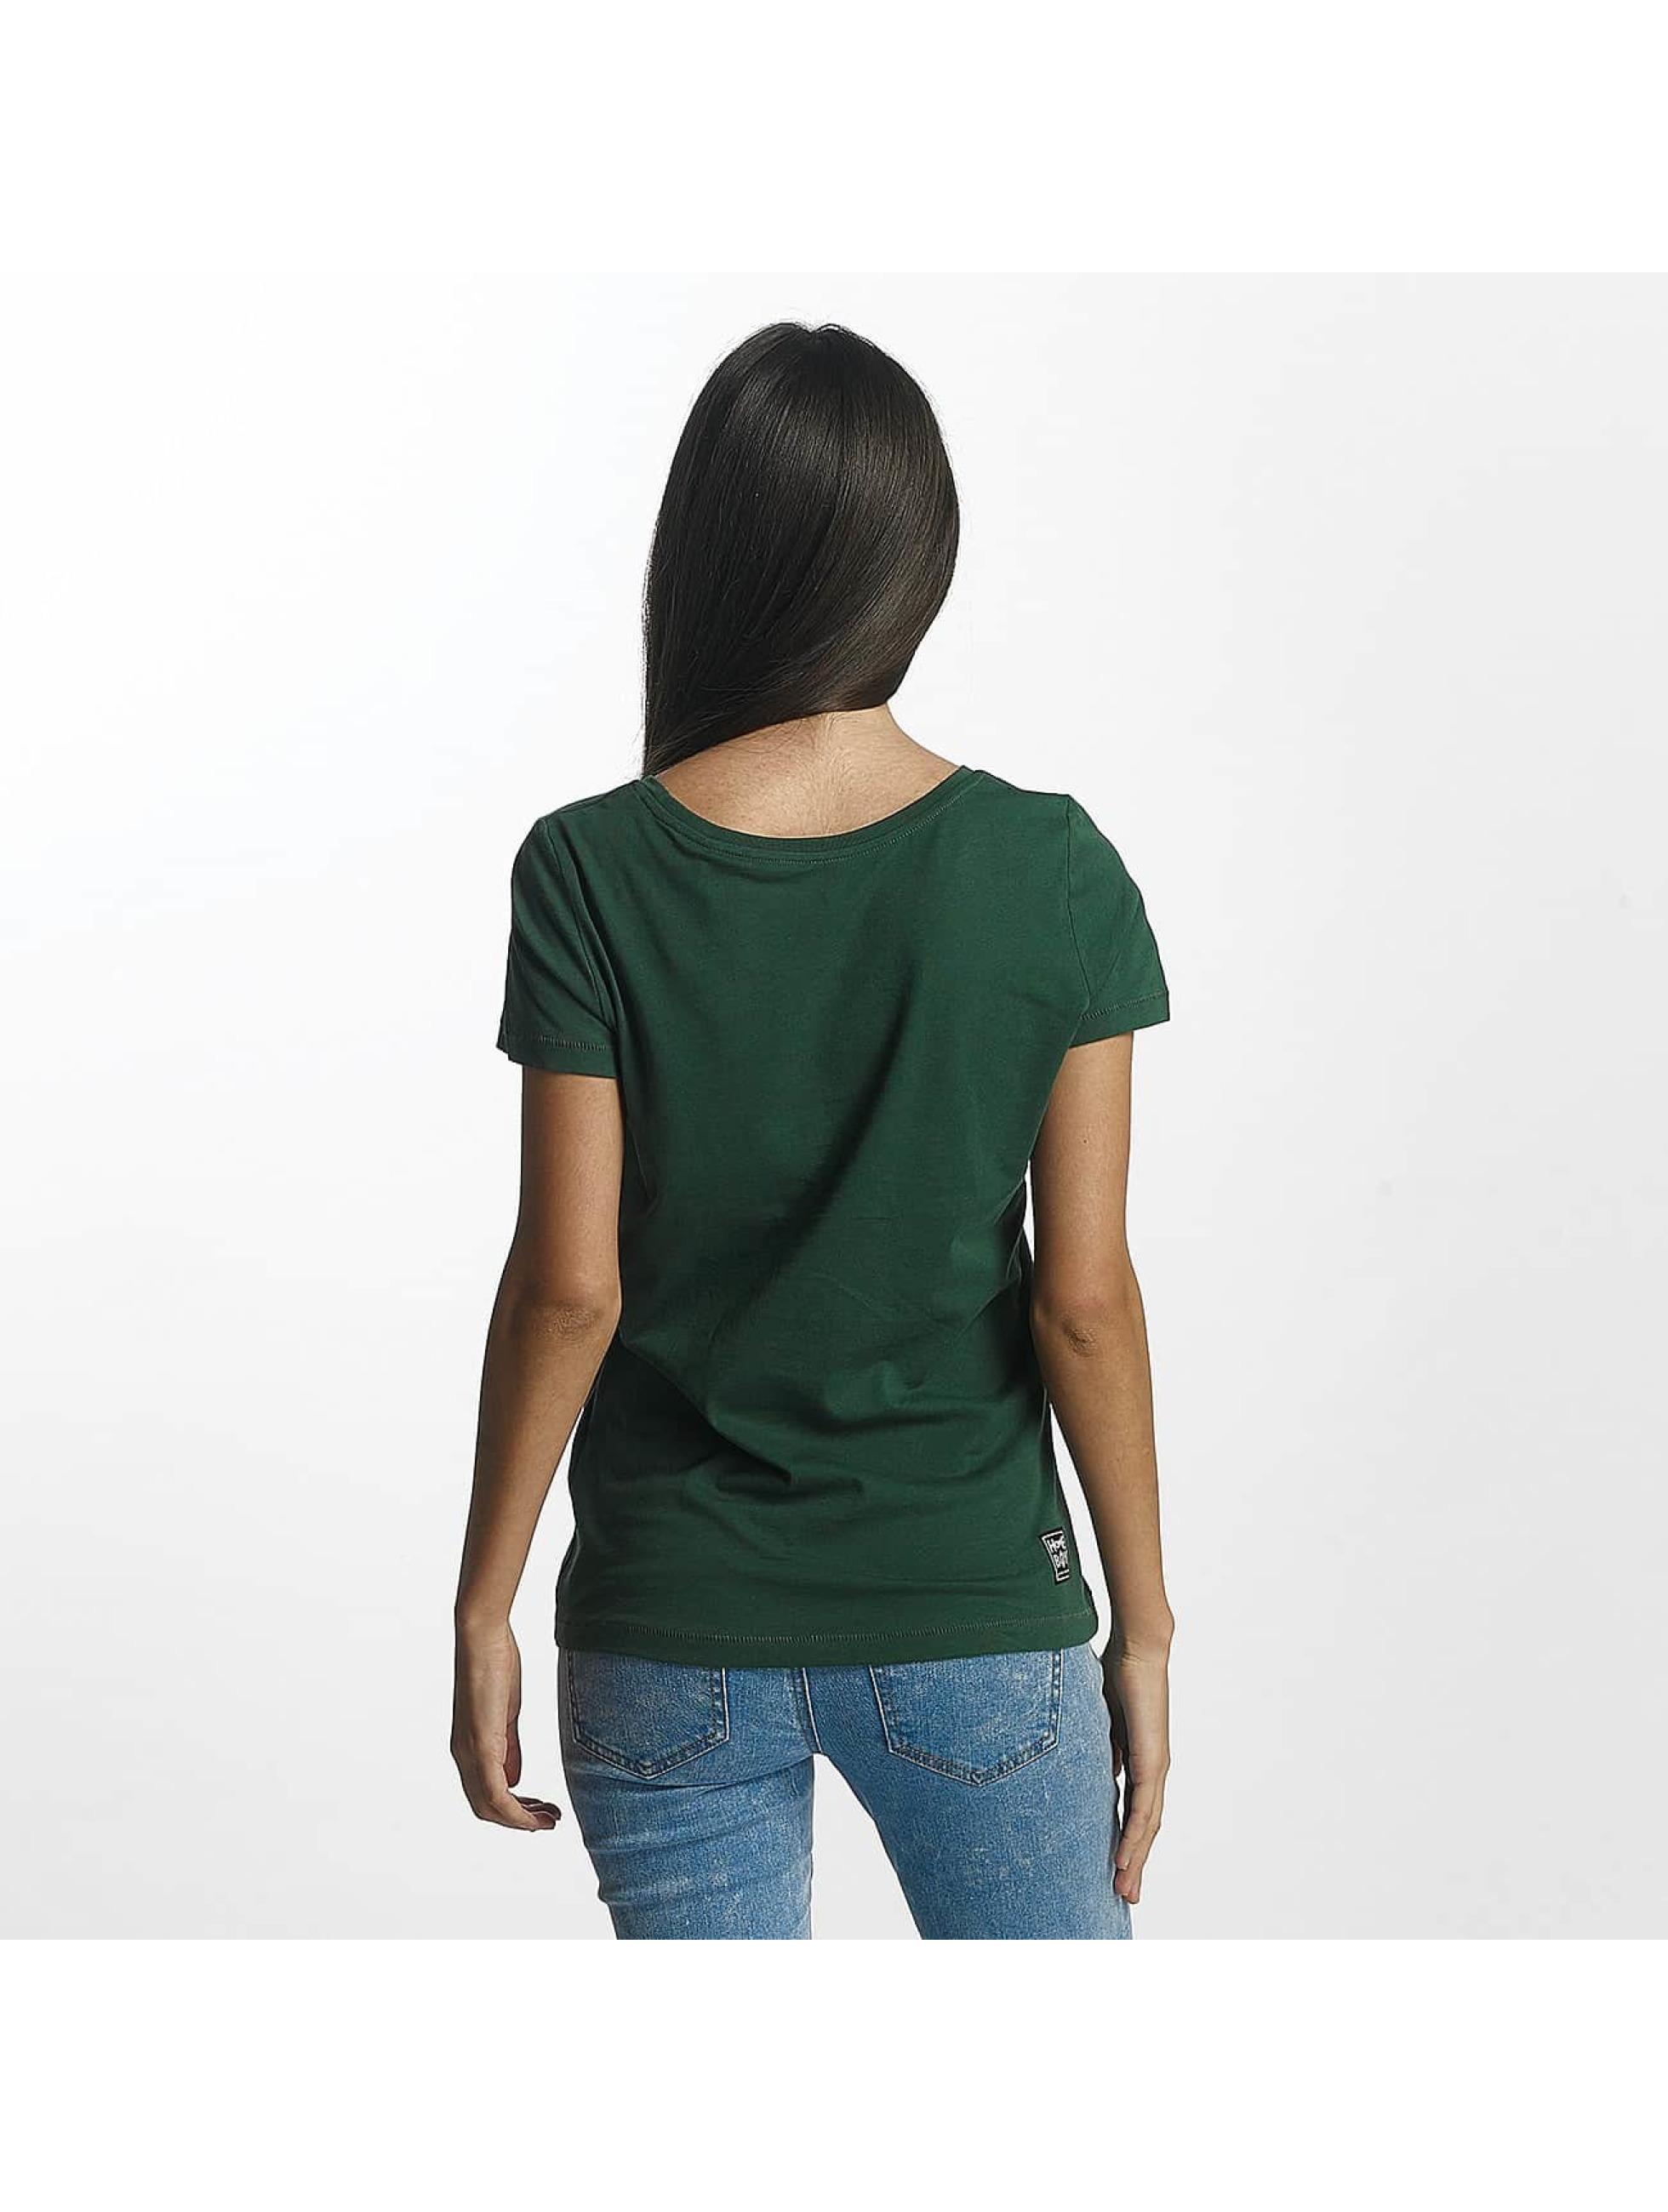 Homeboy T-Shirt Paris olive